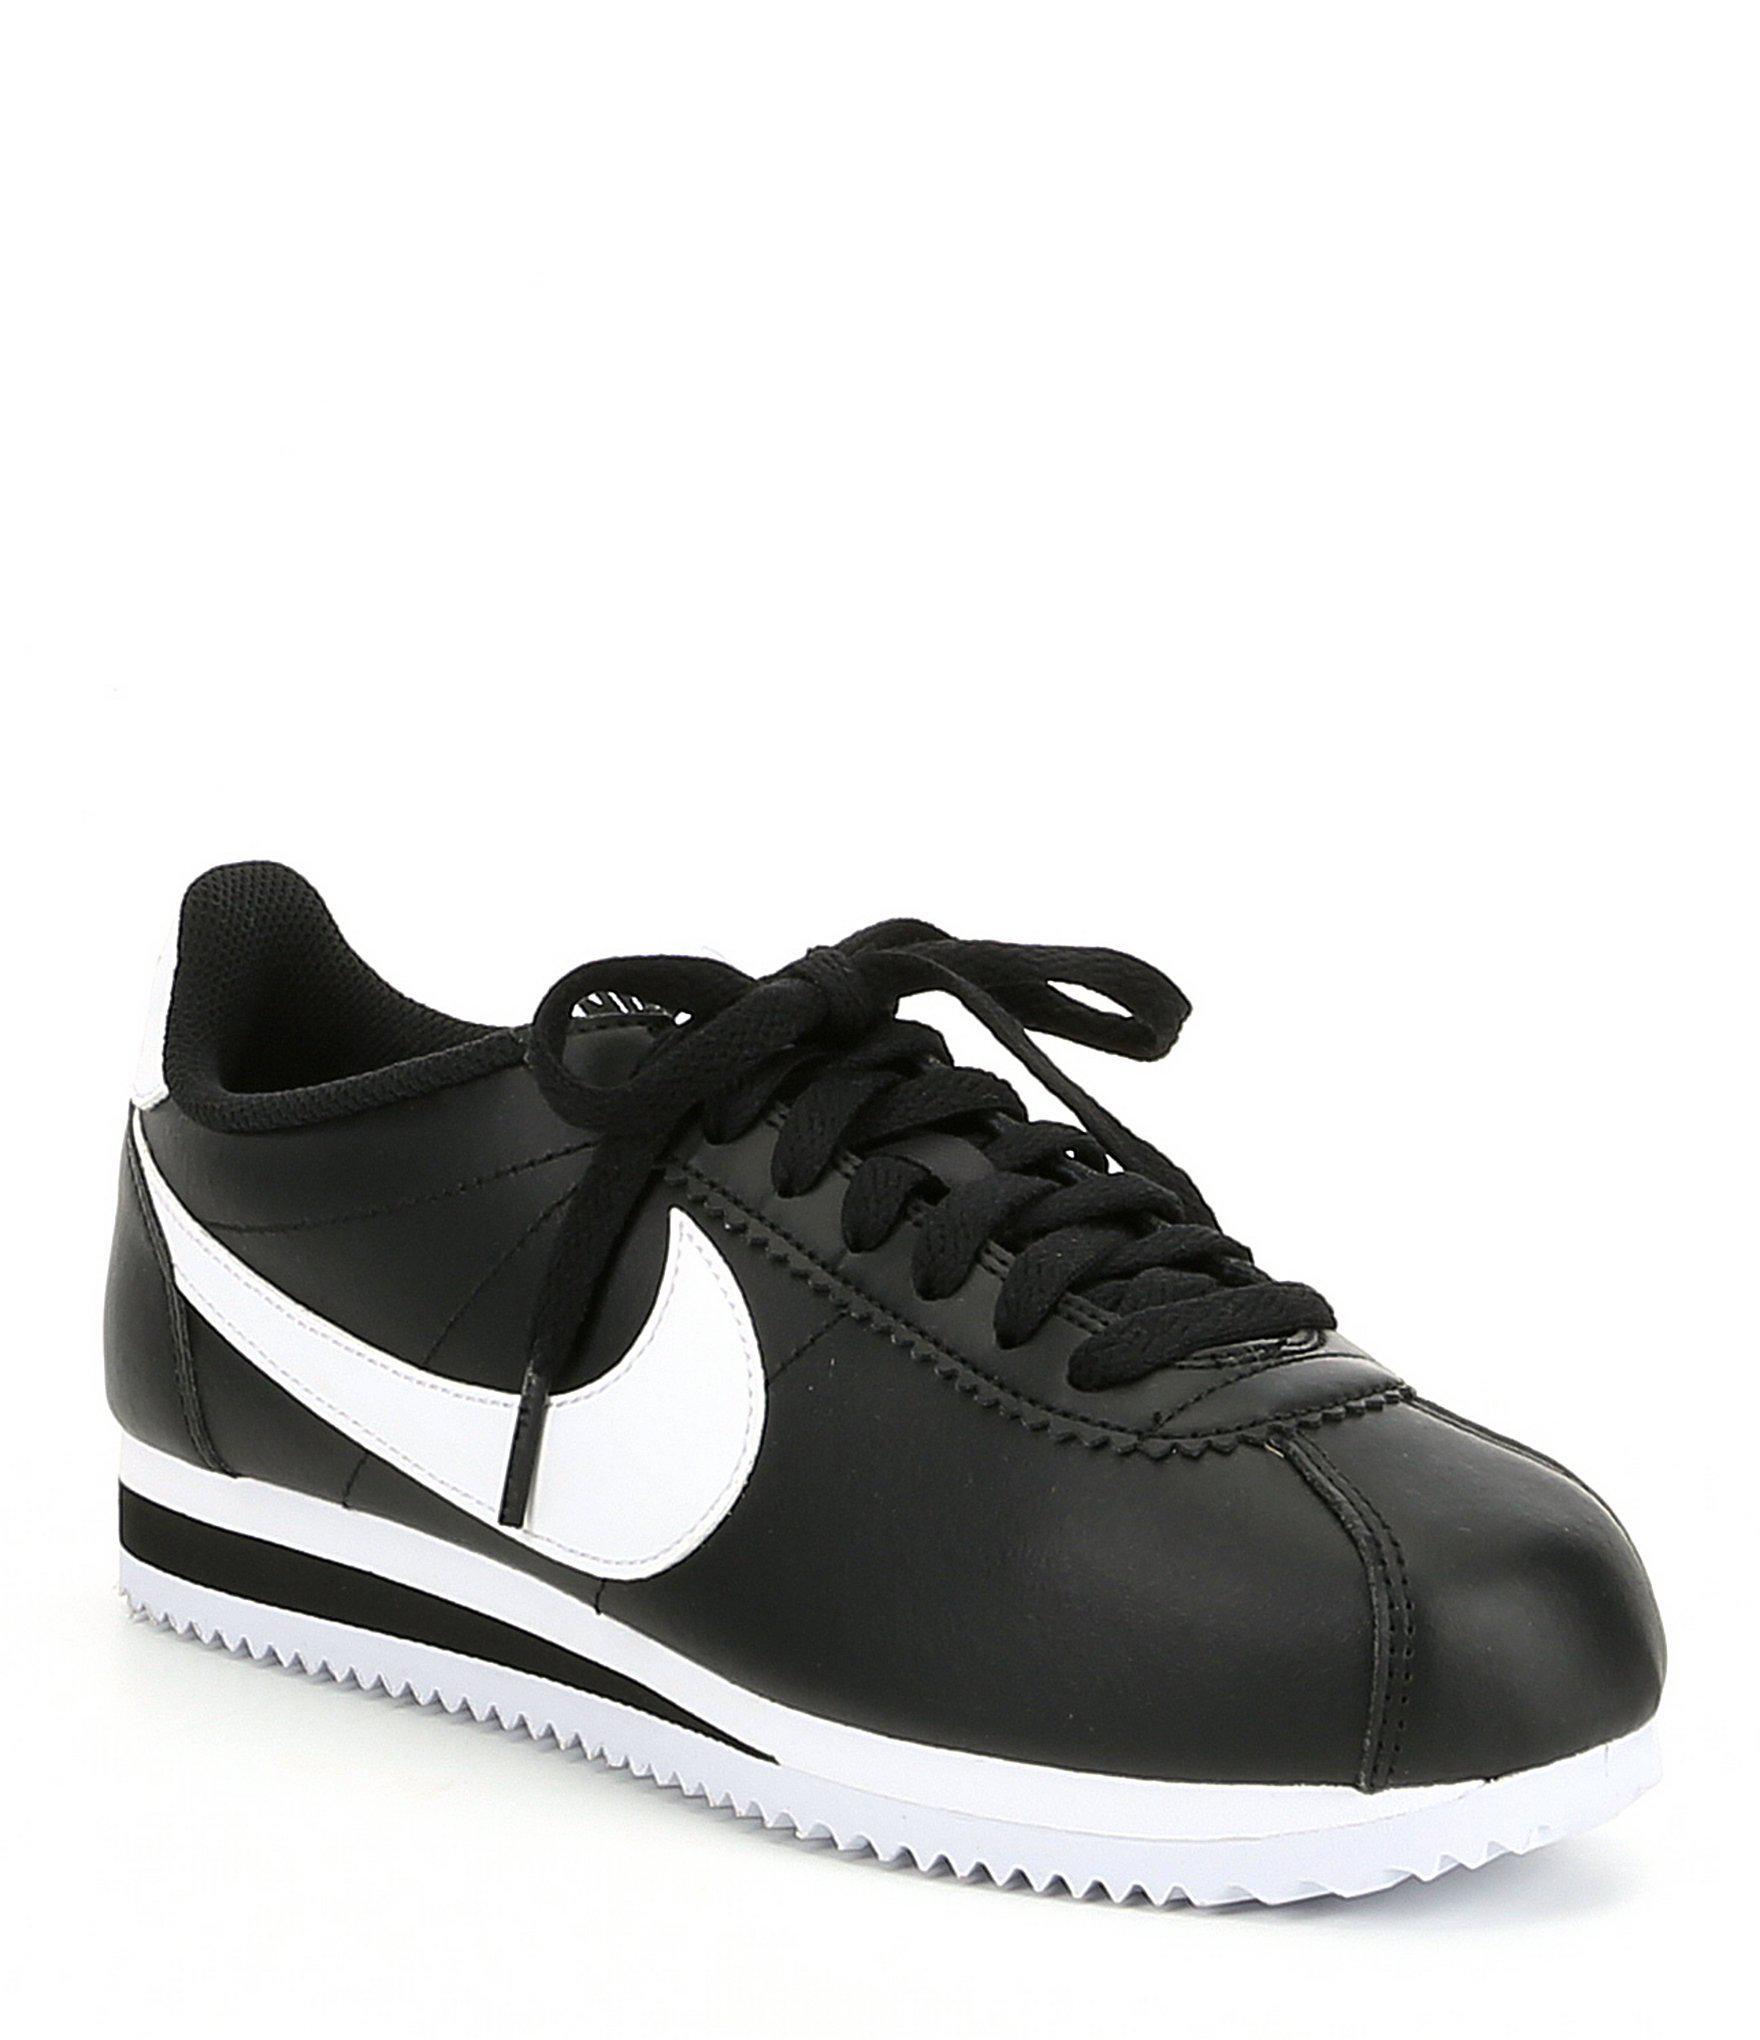 size 40 7e7cf 4eedc Nike. Black Womens Classic Cortez Leather Lifestyle Shoe